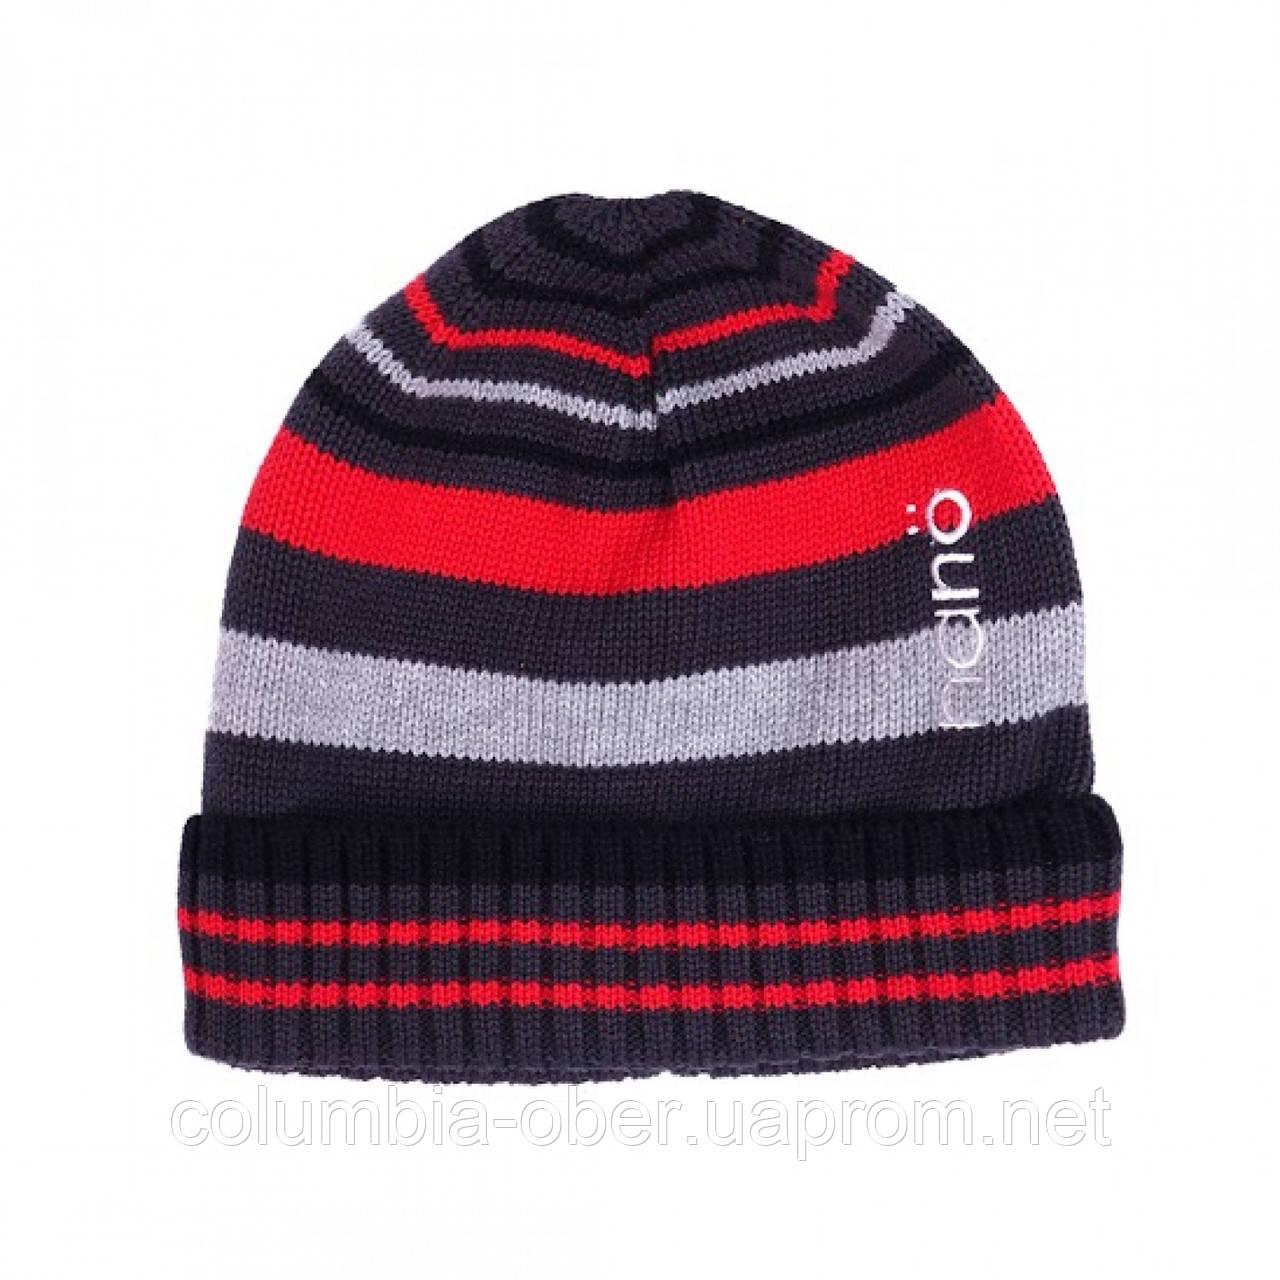 Демисезонная шапка  для мальчика  NANO 202 TUT F16 Glacier Gray.  Р-р  5/6х и 7/12.